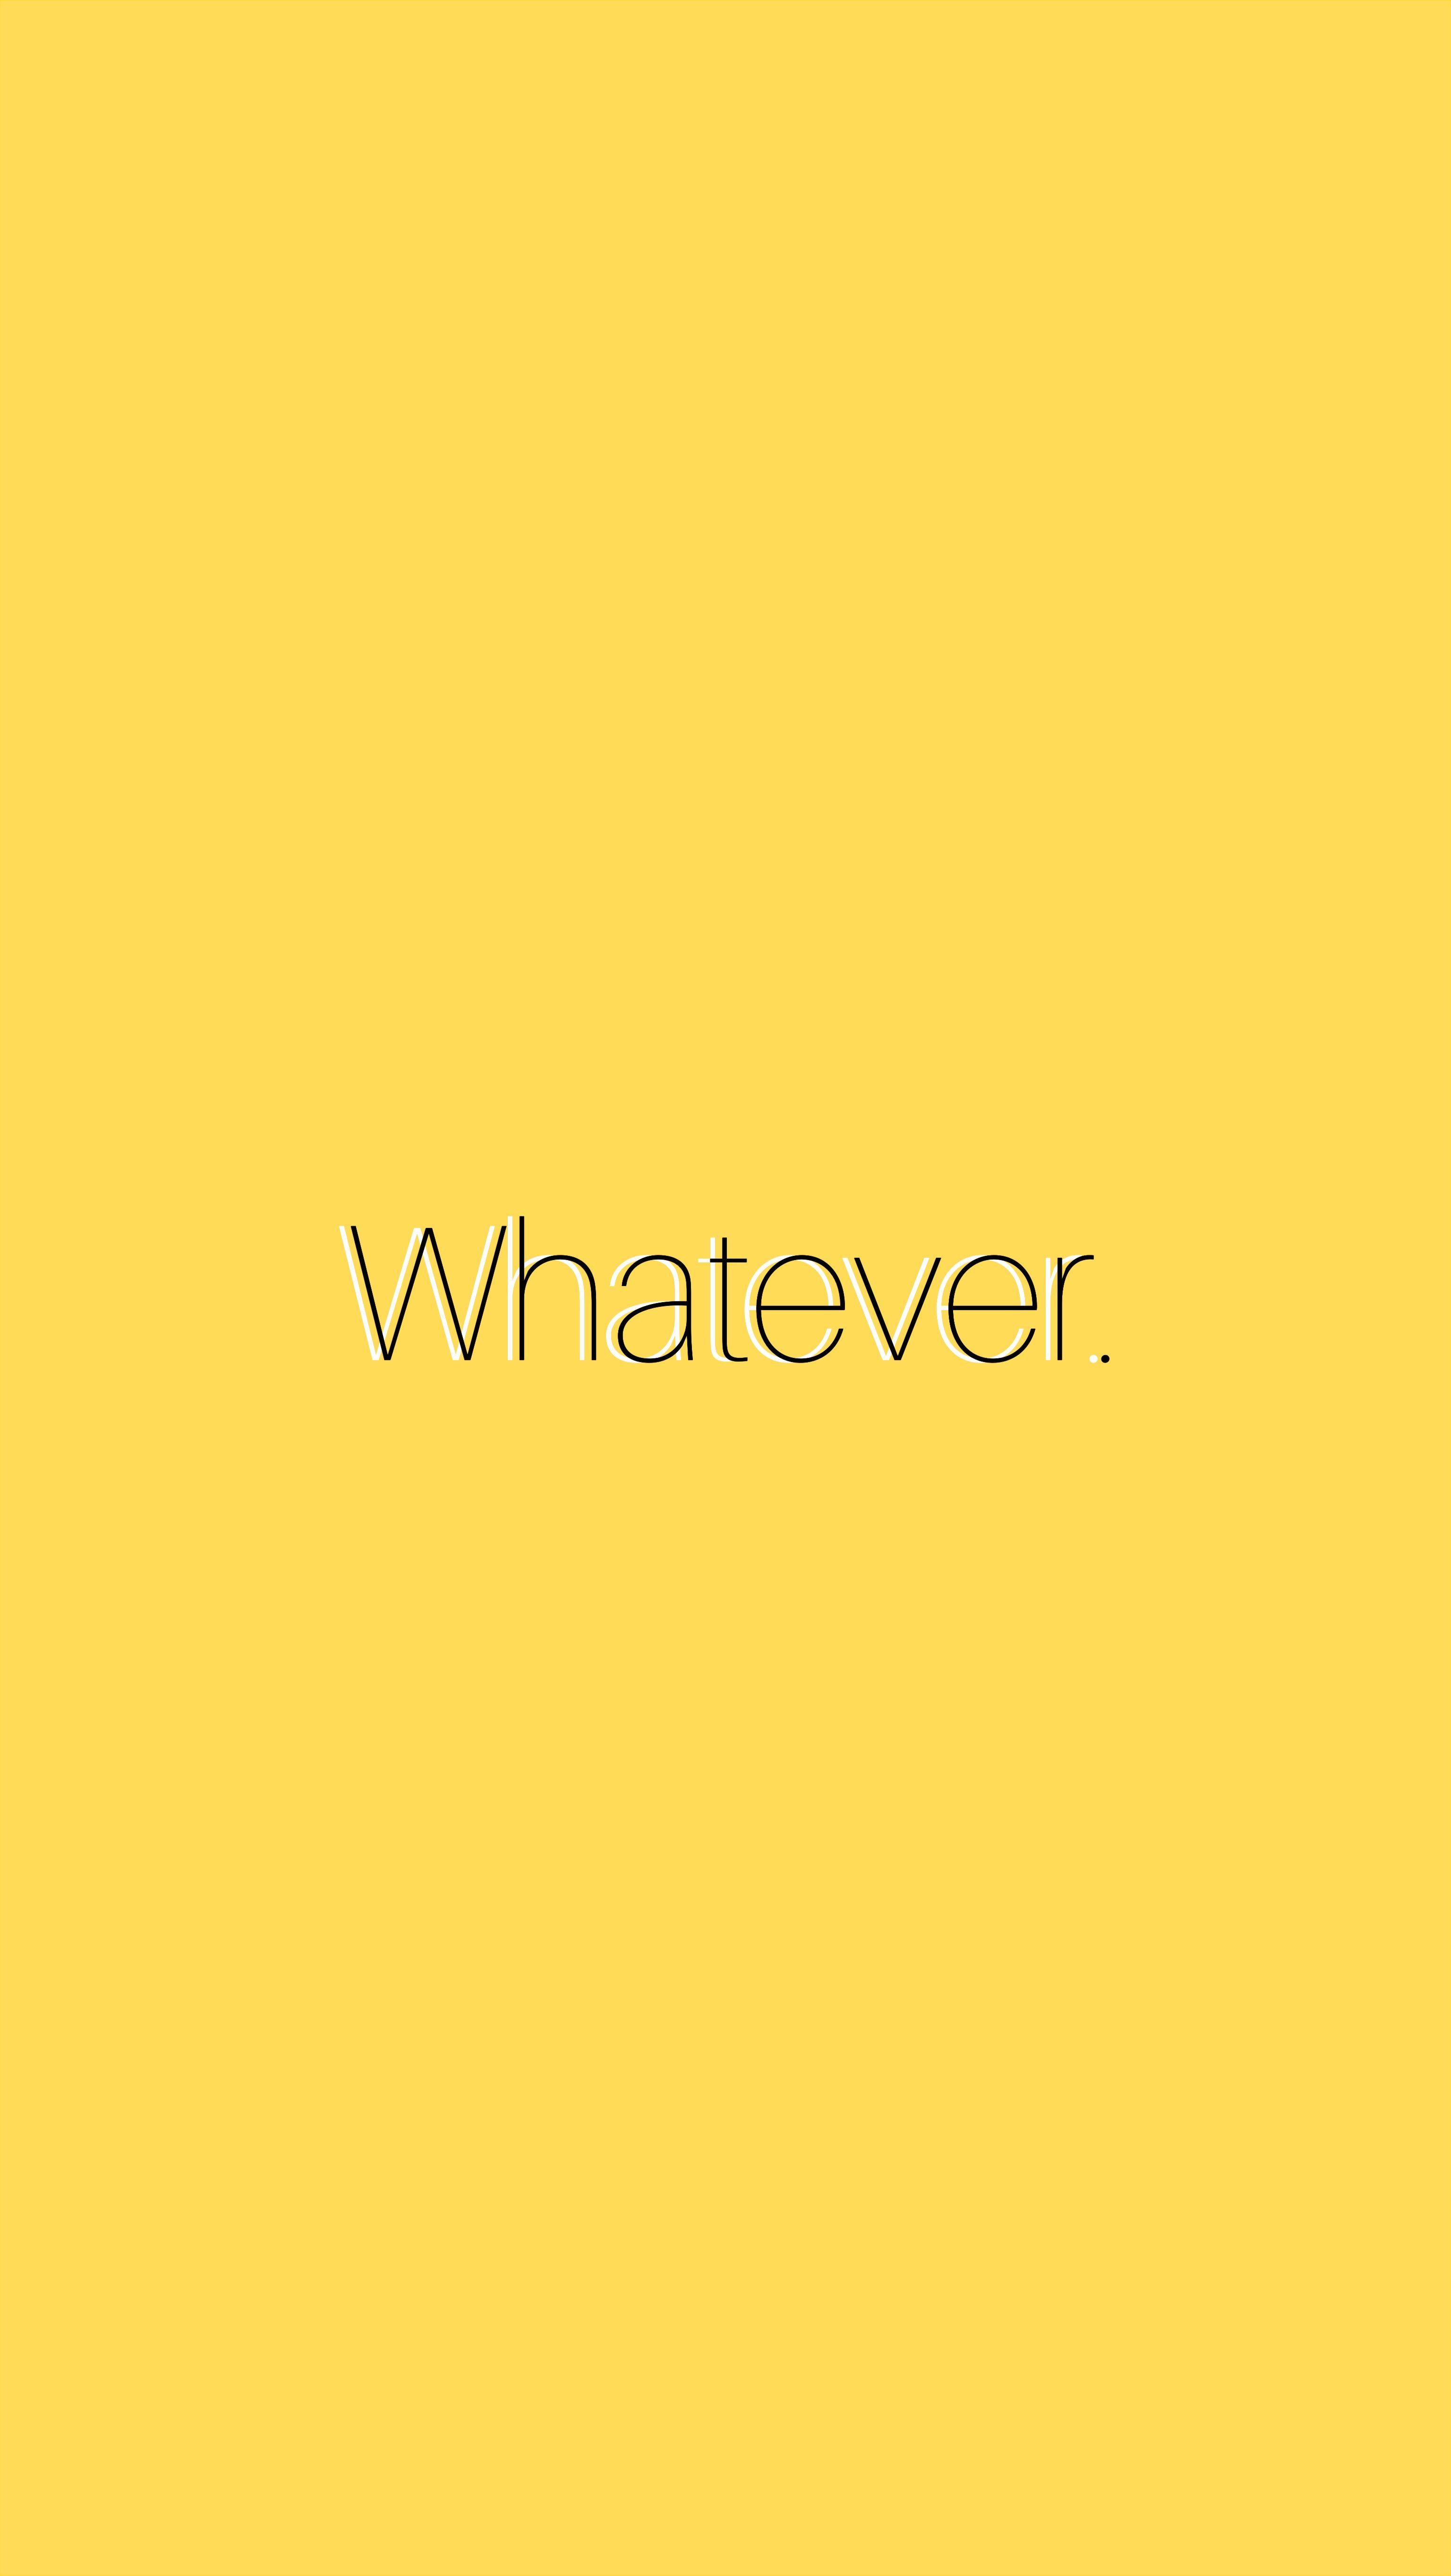 Bitchloe Yellow Wallpaper Yellow Aesthetic Pastel Normal Wallpaper